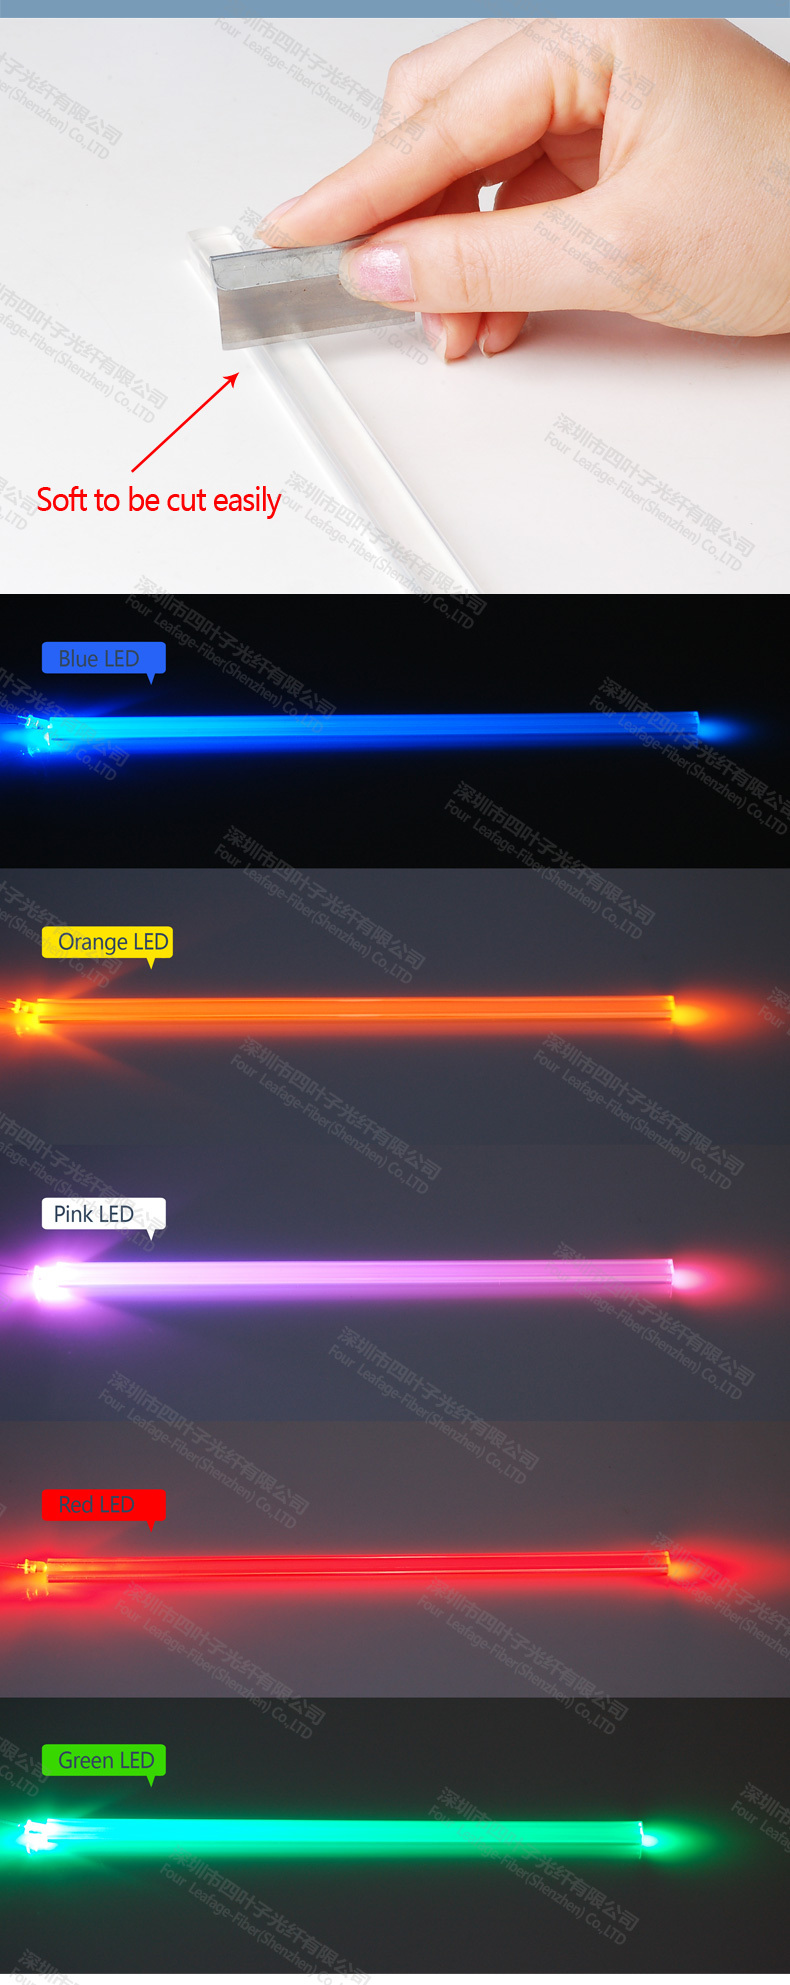 Price Per Meter 5 X 5mm Square Tpu Side Glow Optical Fiber Optic ...